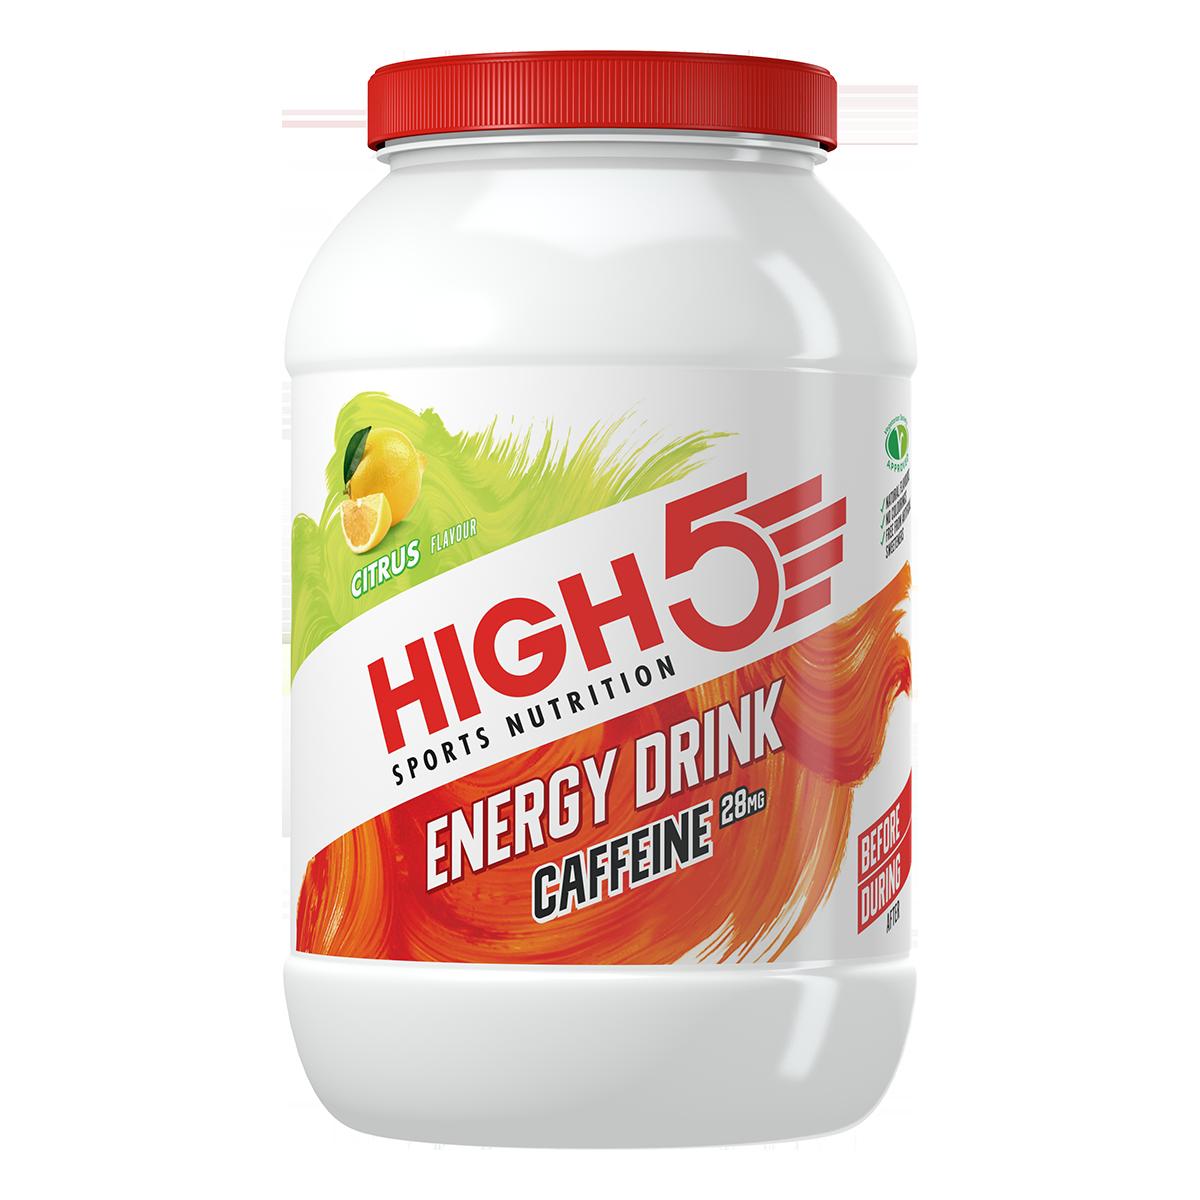 Energy-Drink-Caffeine_Citrus_2200g_Front_RGB_1200x1200.png